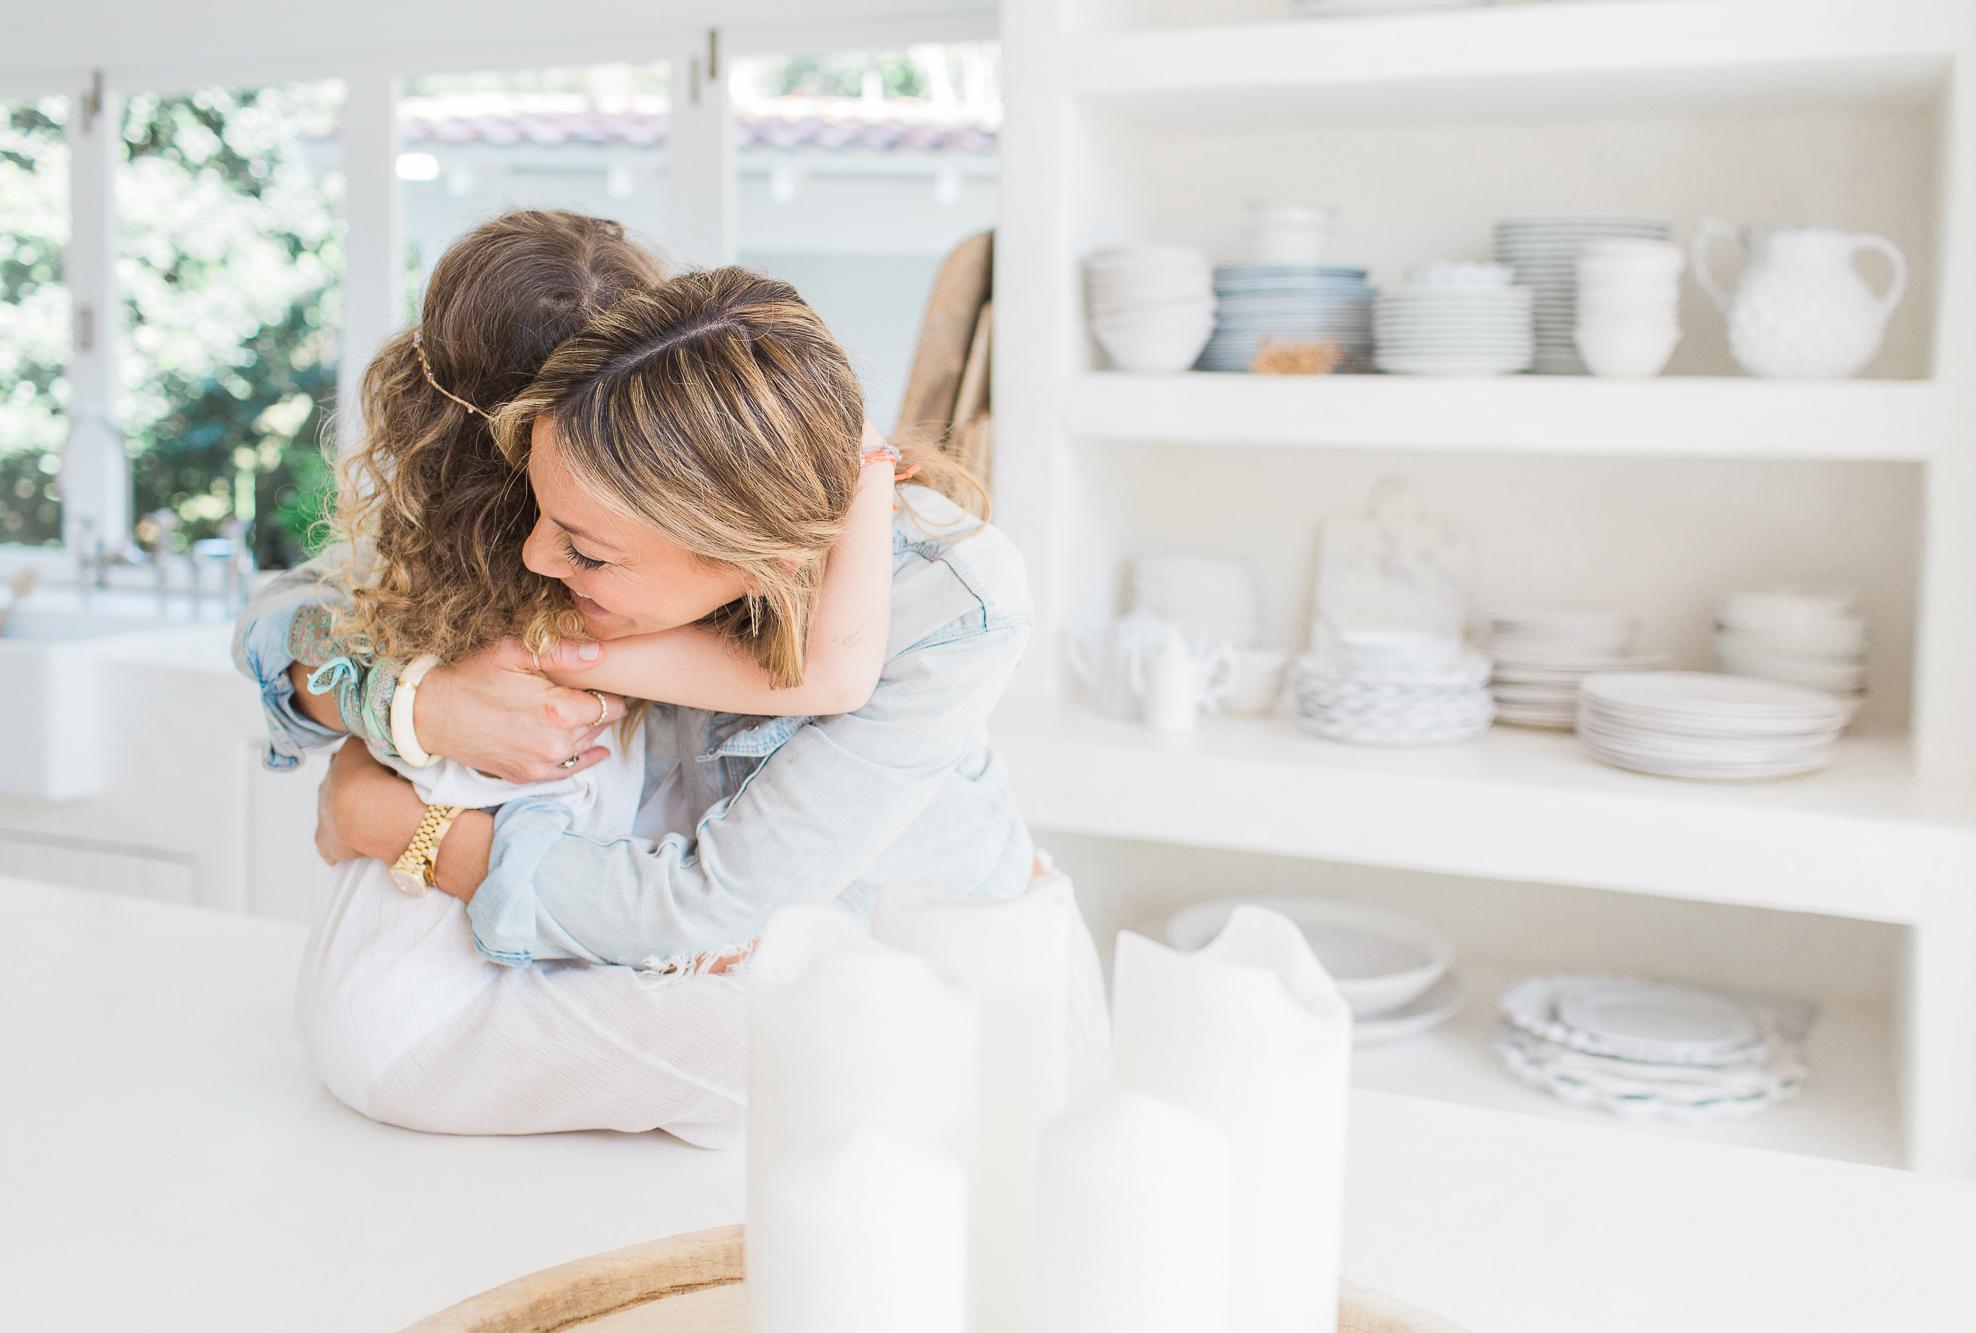 Stylist Romi Weinberg on kids' room decorating ideas and motherhood